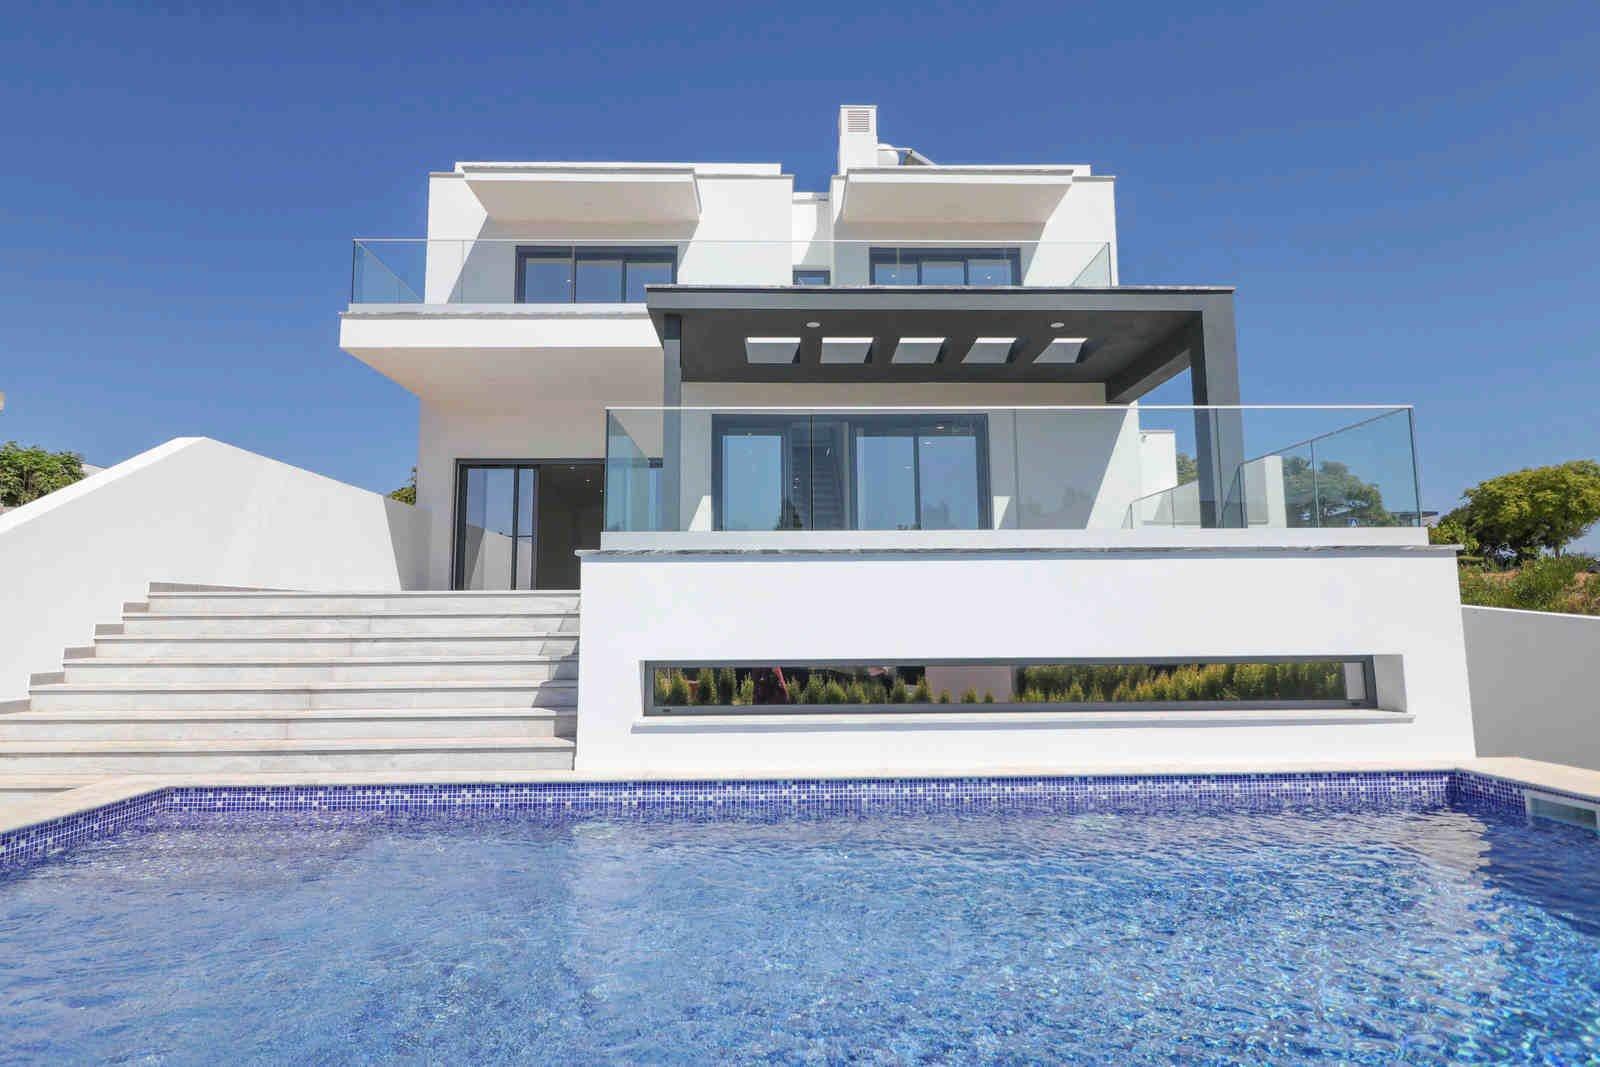 3 Bedroom Villa Quarteira, Central Algarve Ref: PV3584